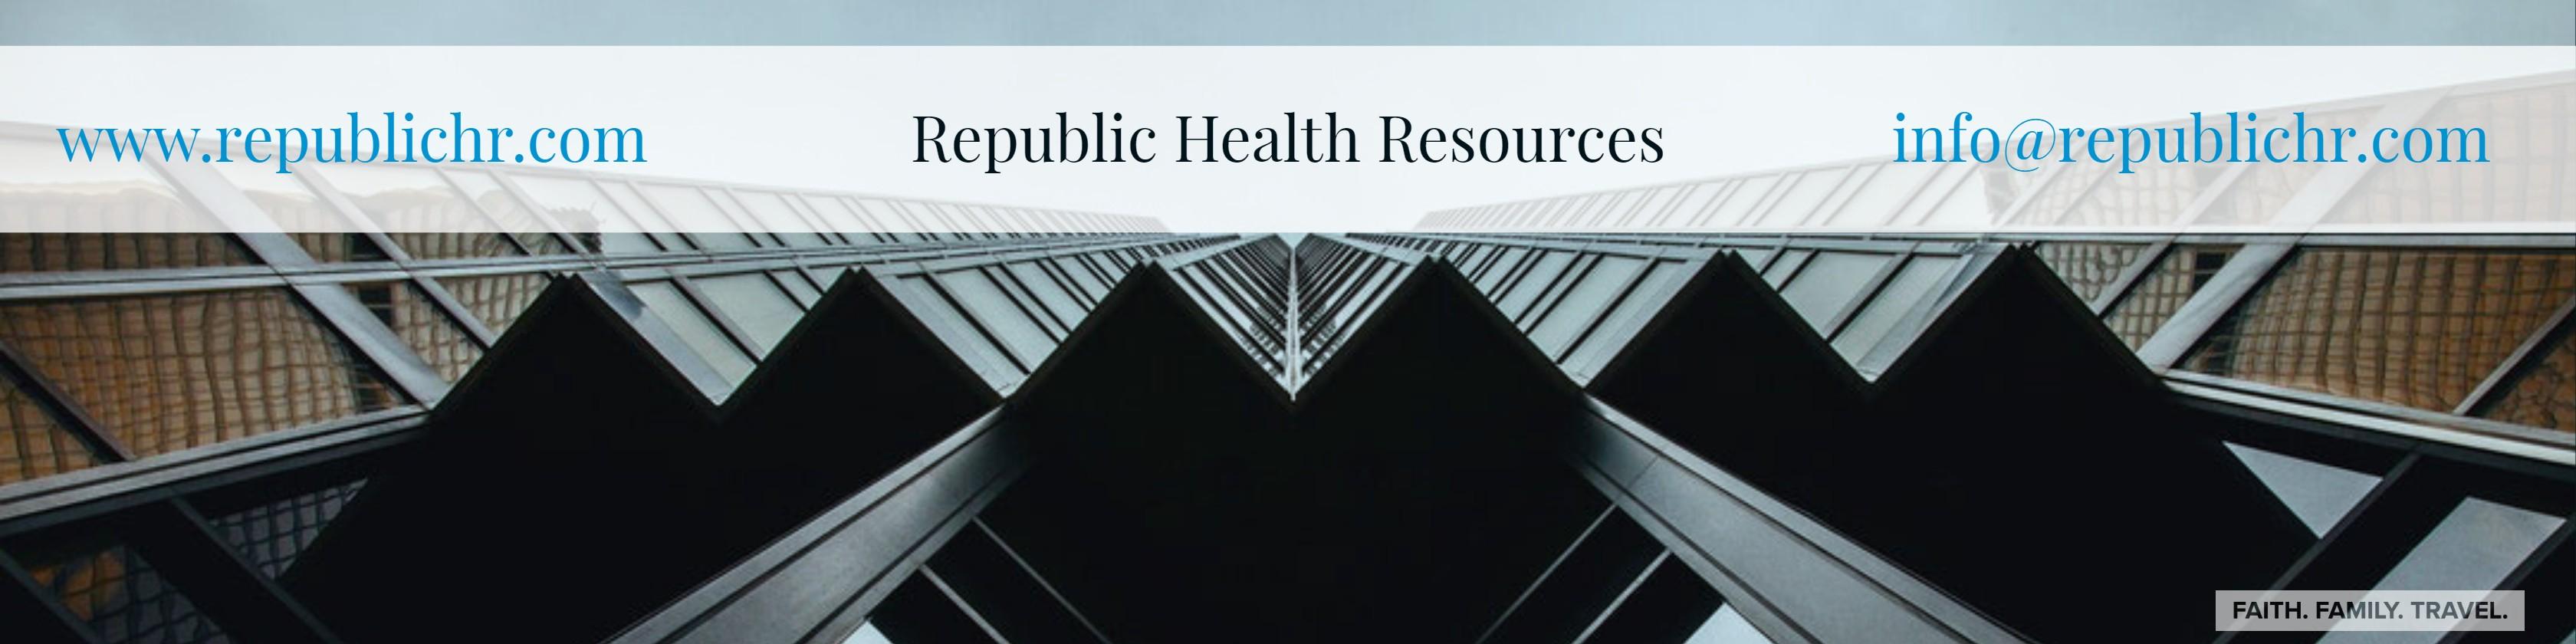 Republic Health Resources Linkedin